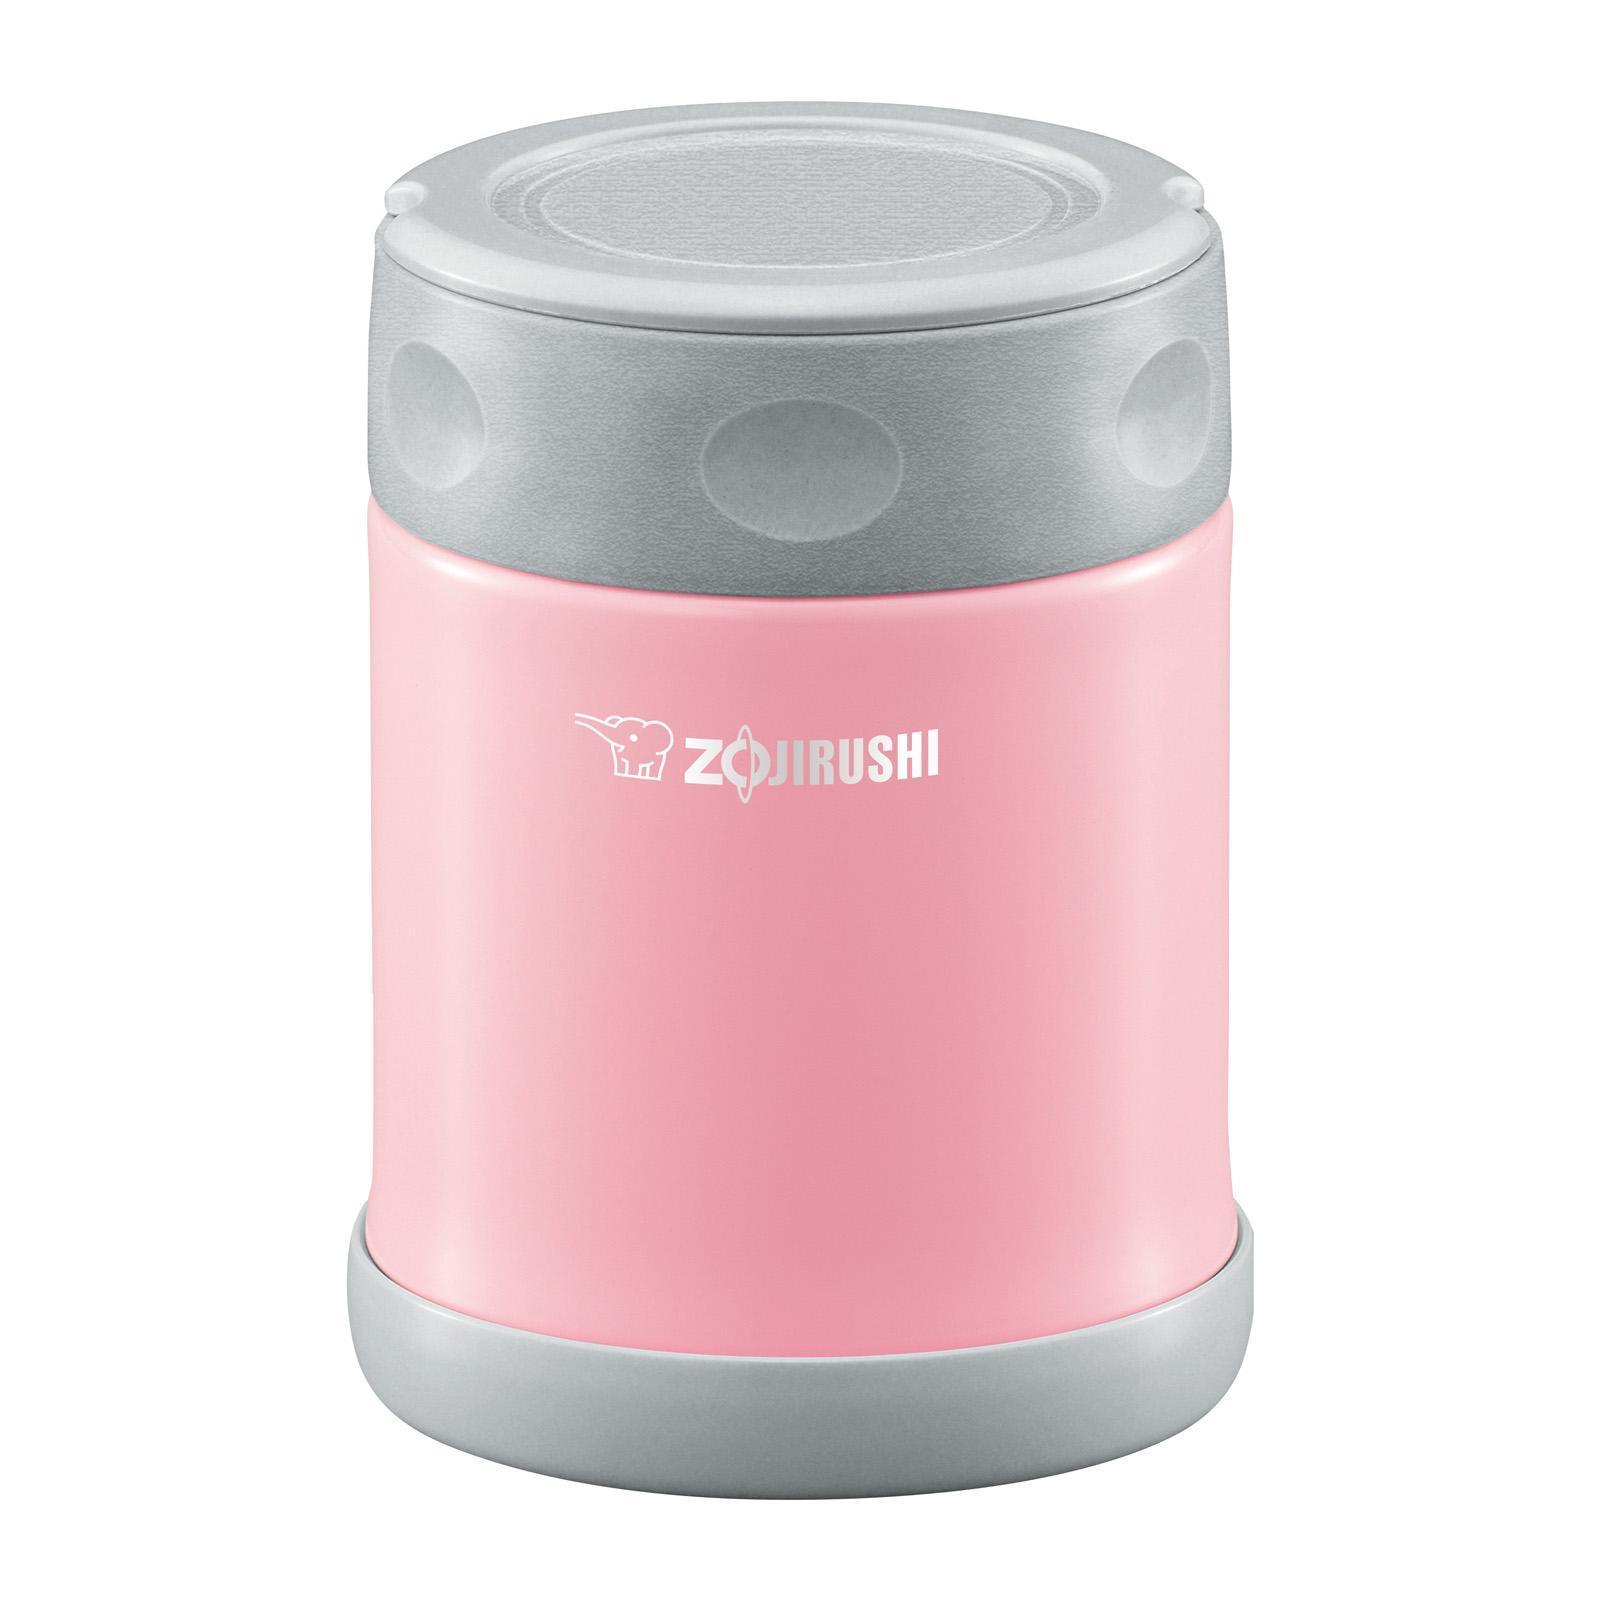 Zojirushi Stainless Steel Food Jar (Pink) - Lunch Kit 0.35L